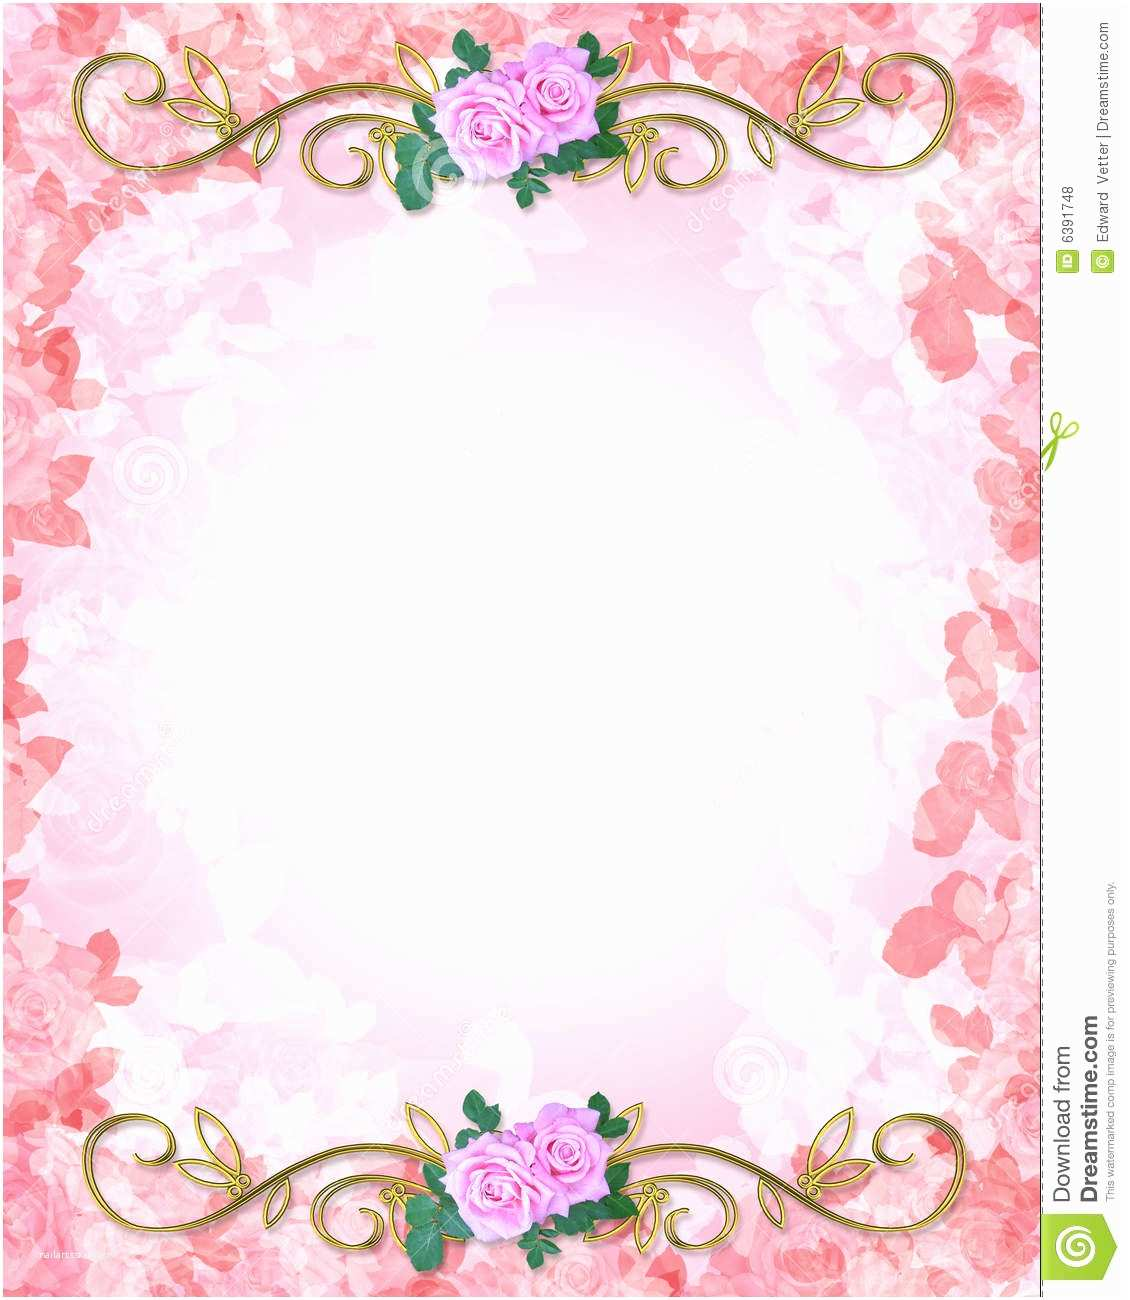 Wedding Invitation Design Templates Free Download Wedding Invitation Templates Free